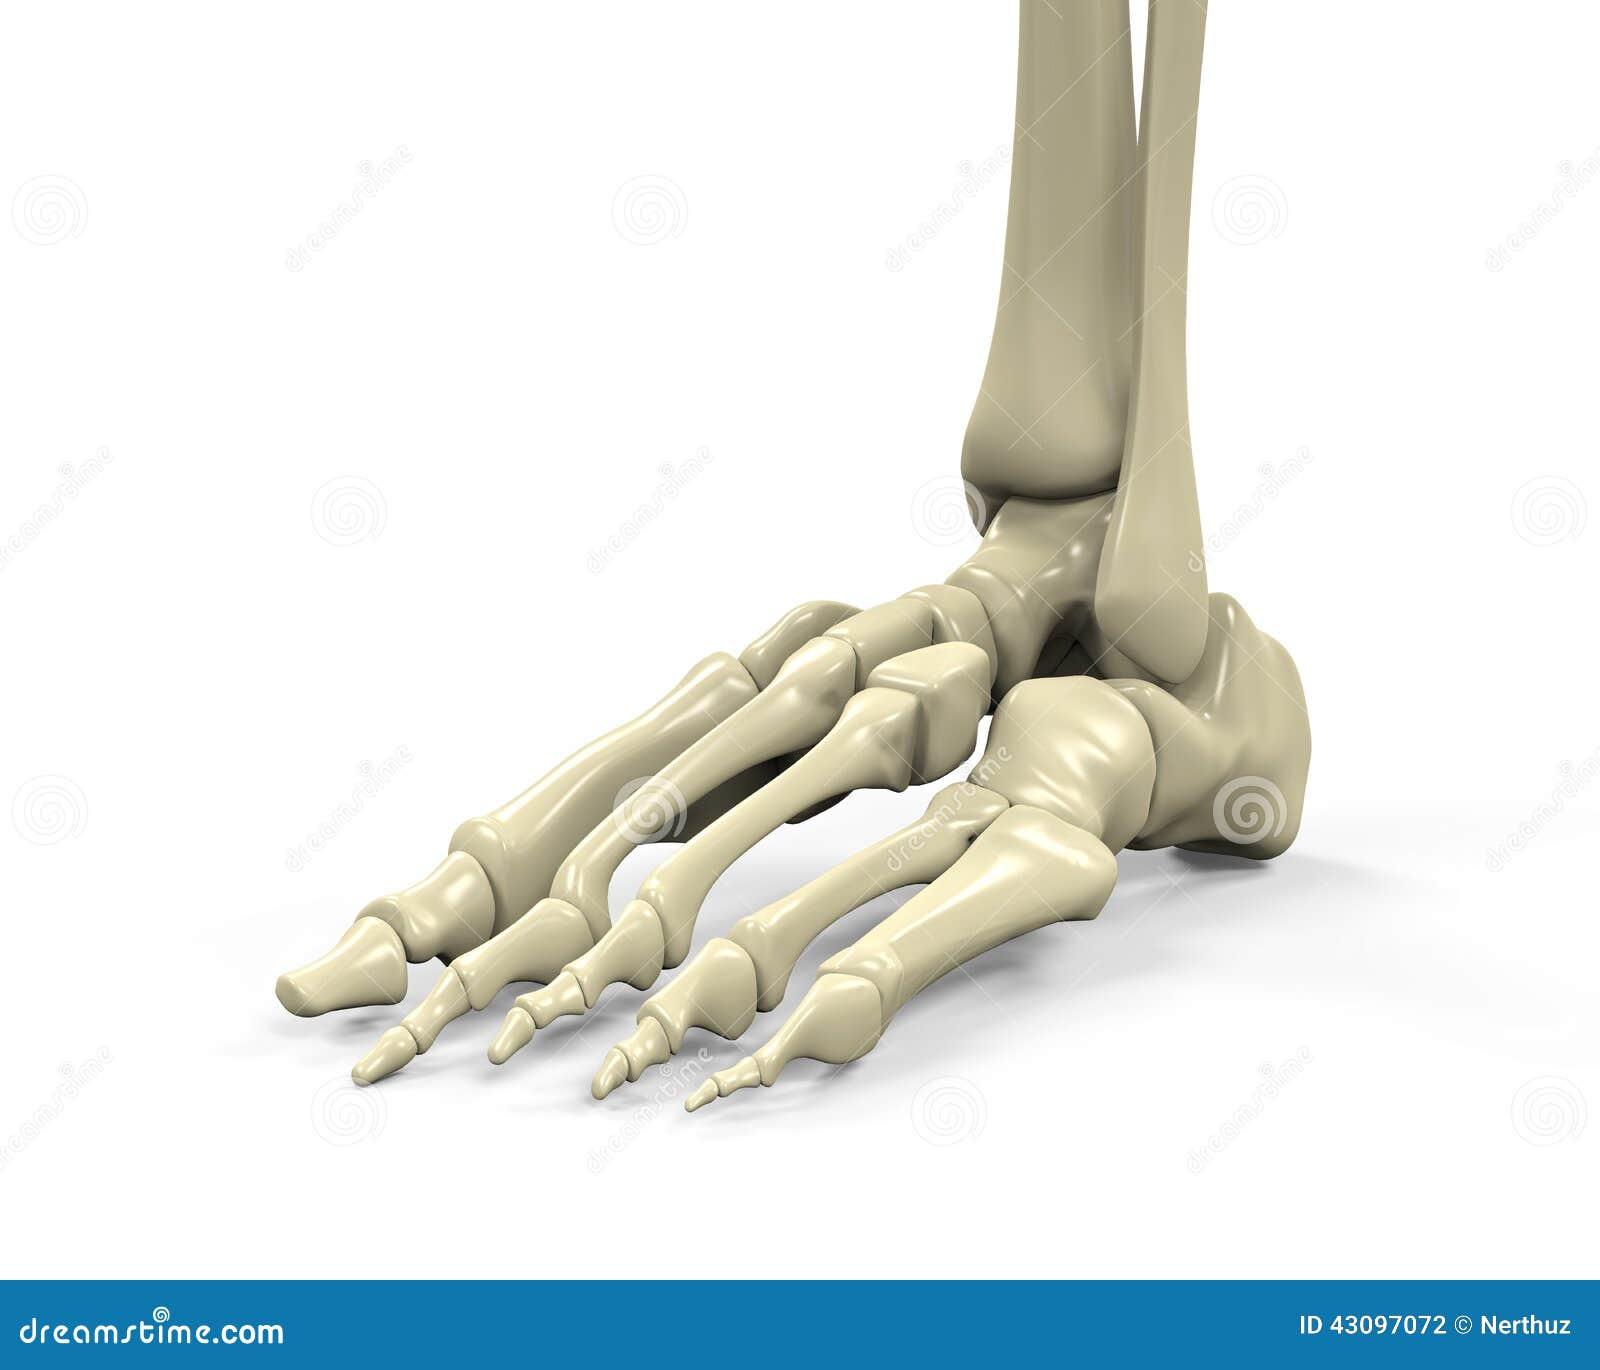 fu skelett anatomie stock abbildung bild 43097072. Black Bedroom Furniture Sets. Home Design Ideas